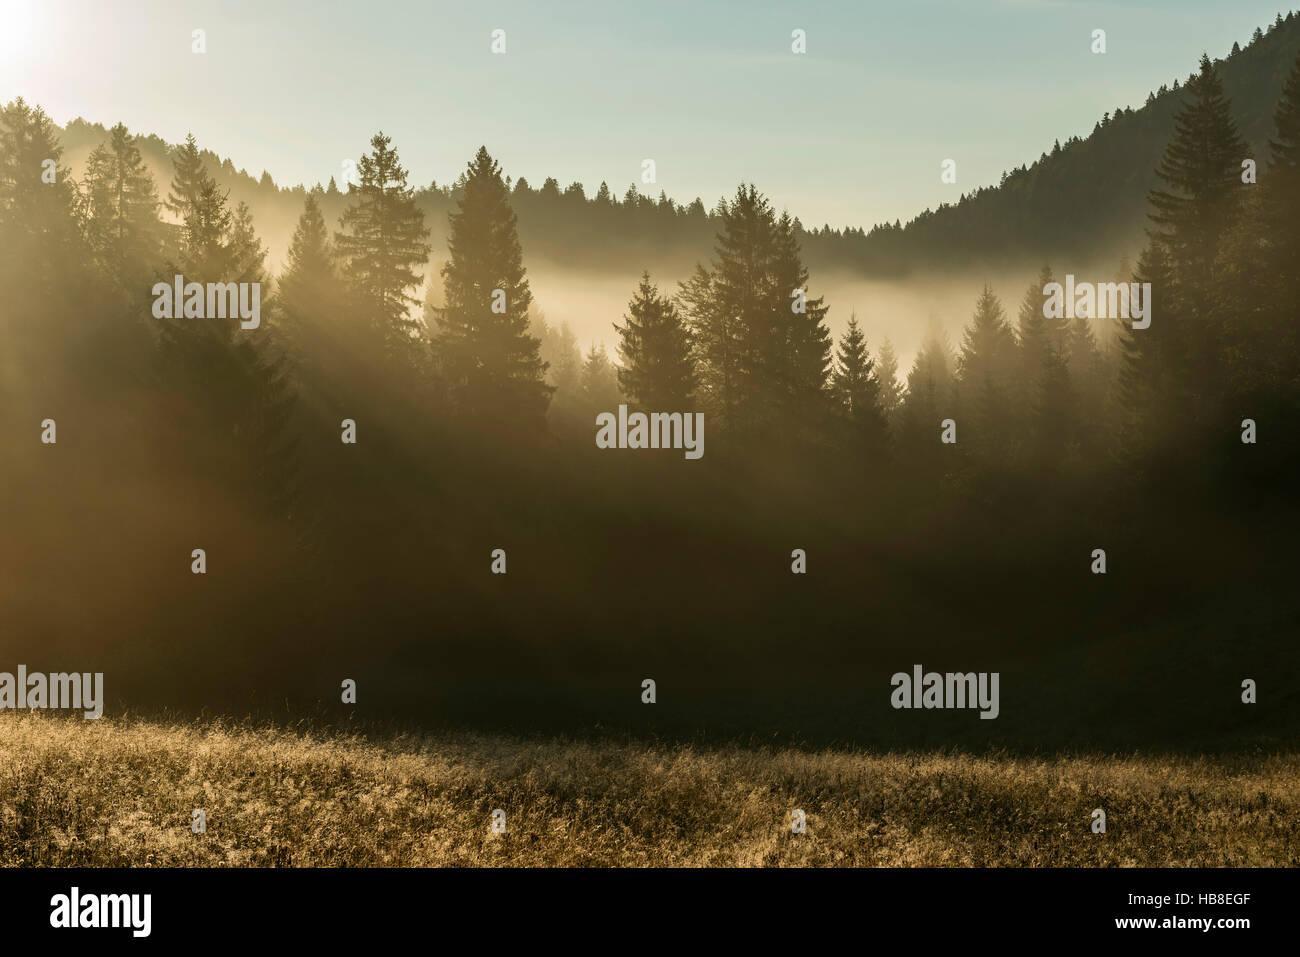 Sunlight shining through treetops, morning mist, Loski Potok, Dolenjska, Slovenia - Stock Image